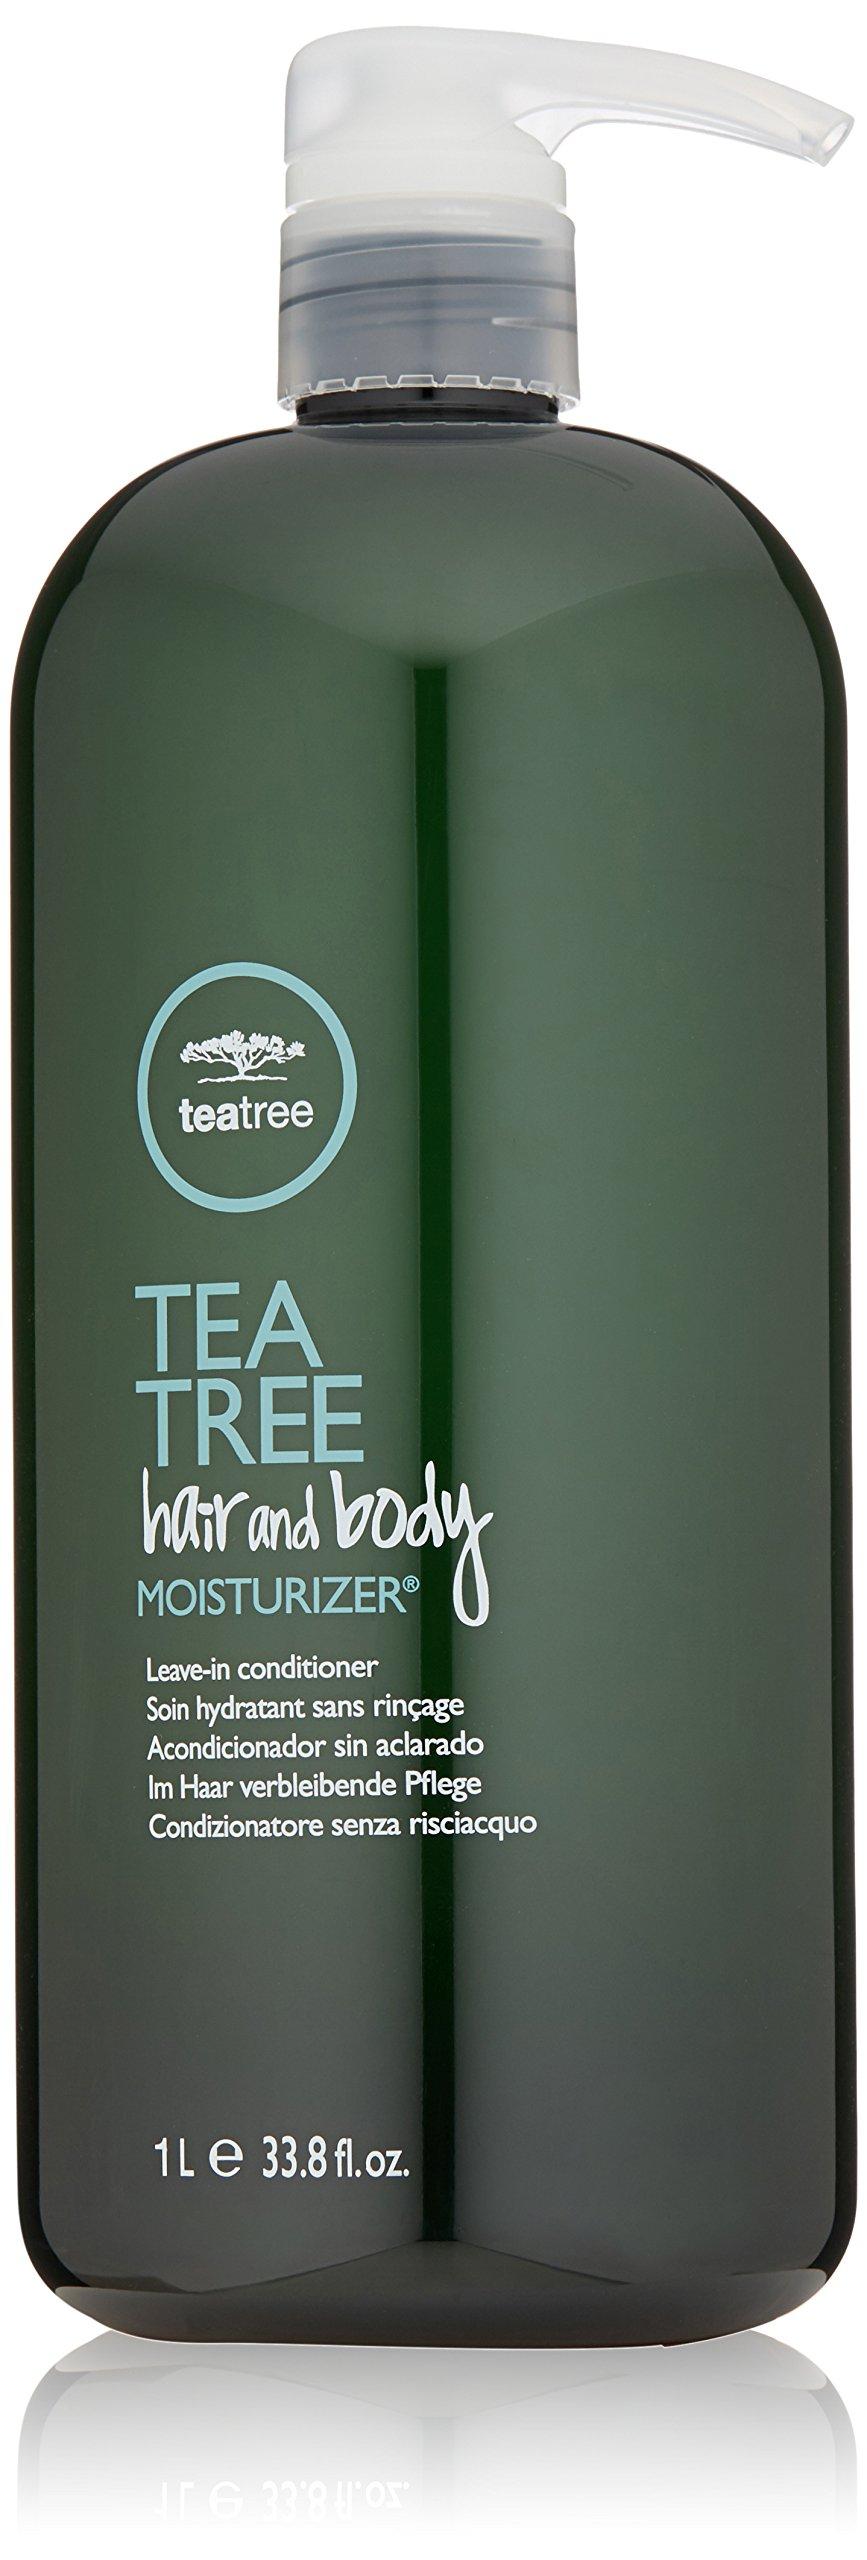 Tea Tree Hair and Body Moisturizer, 33.8 Fl Oz by Tea Tree